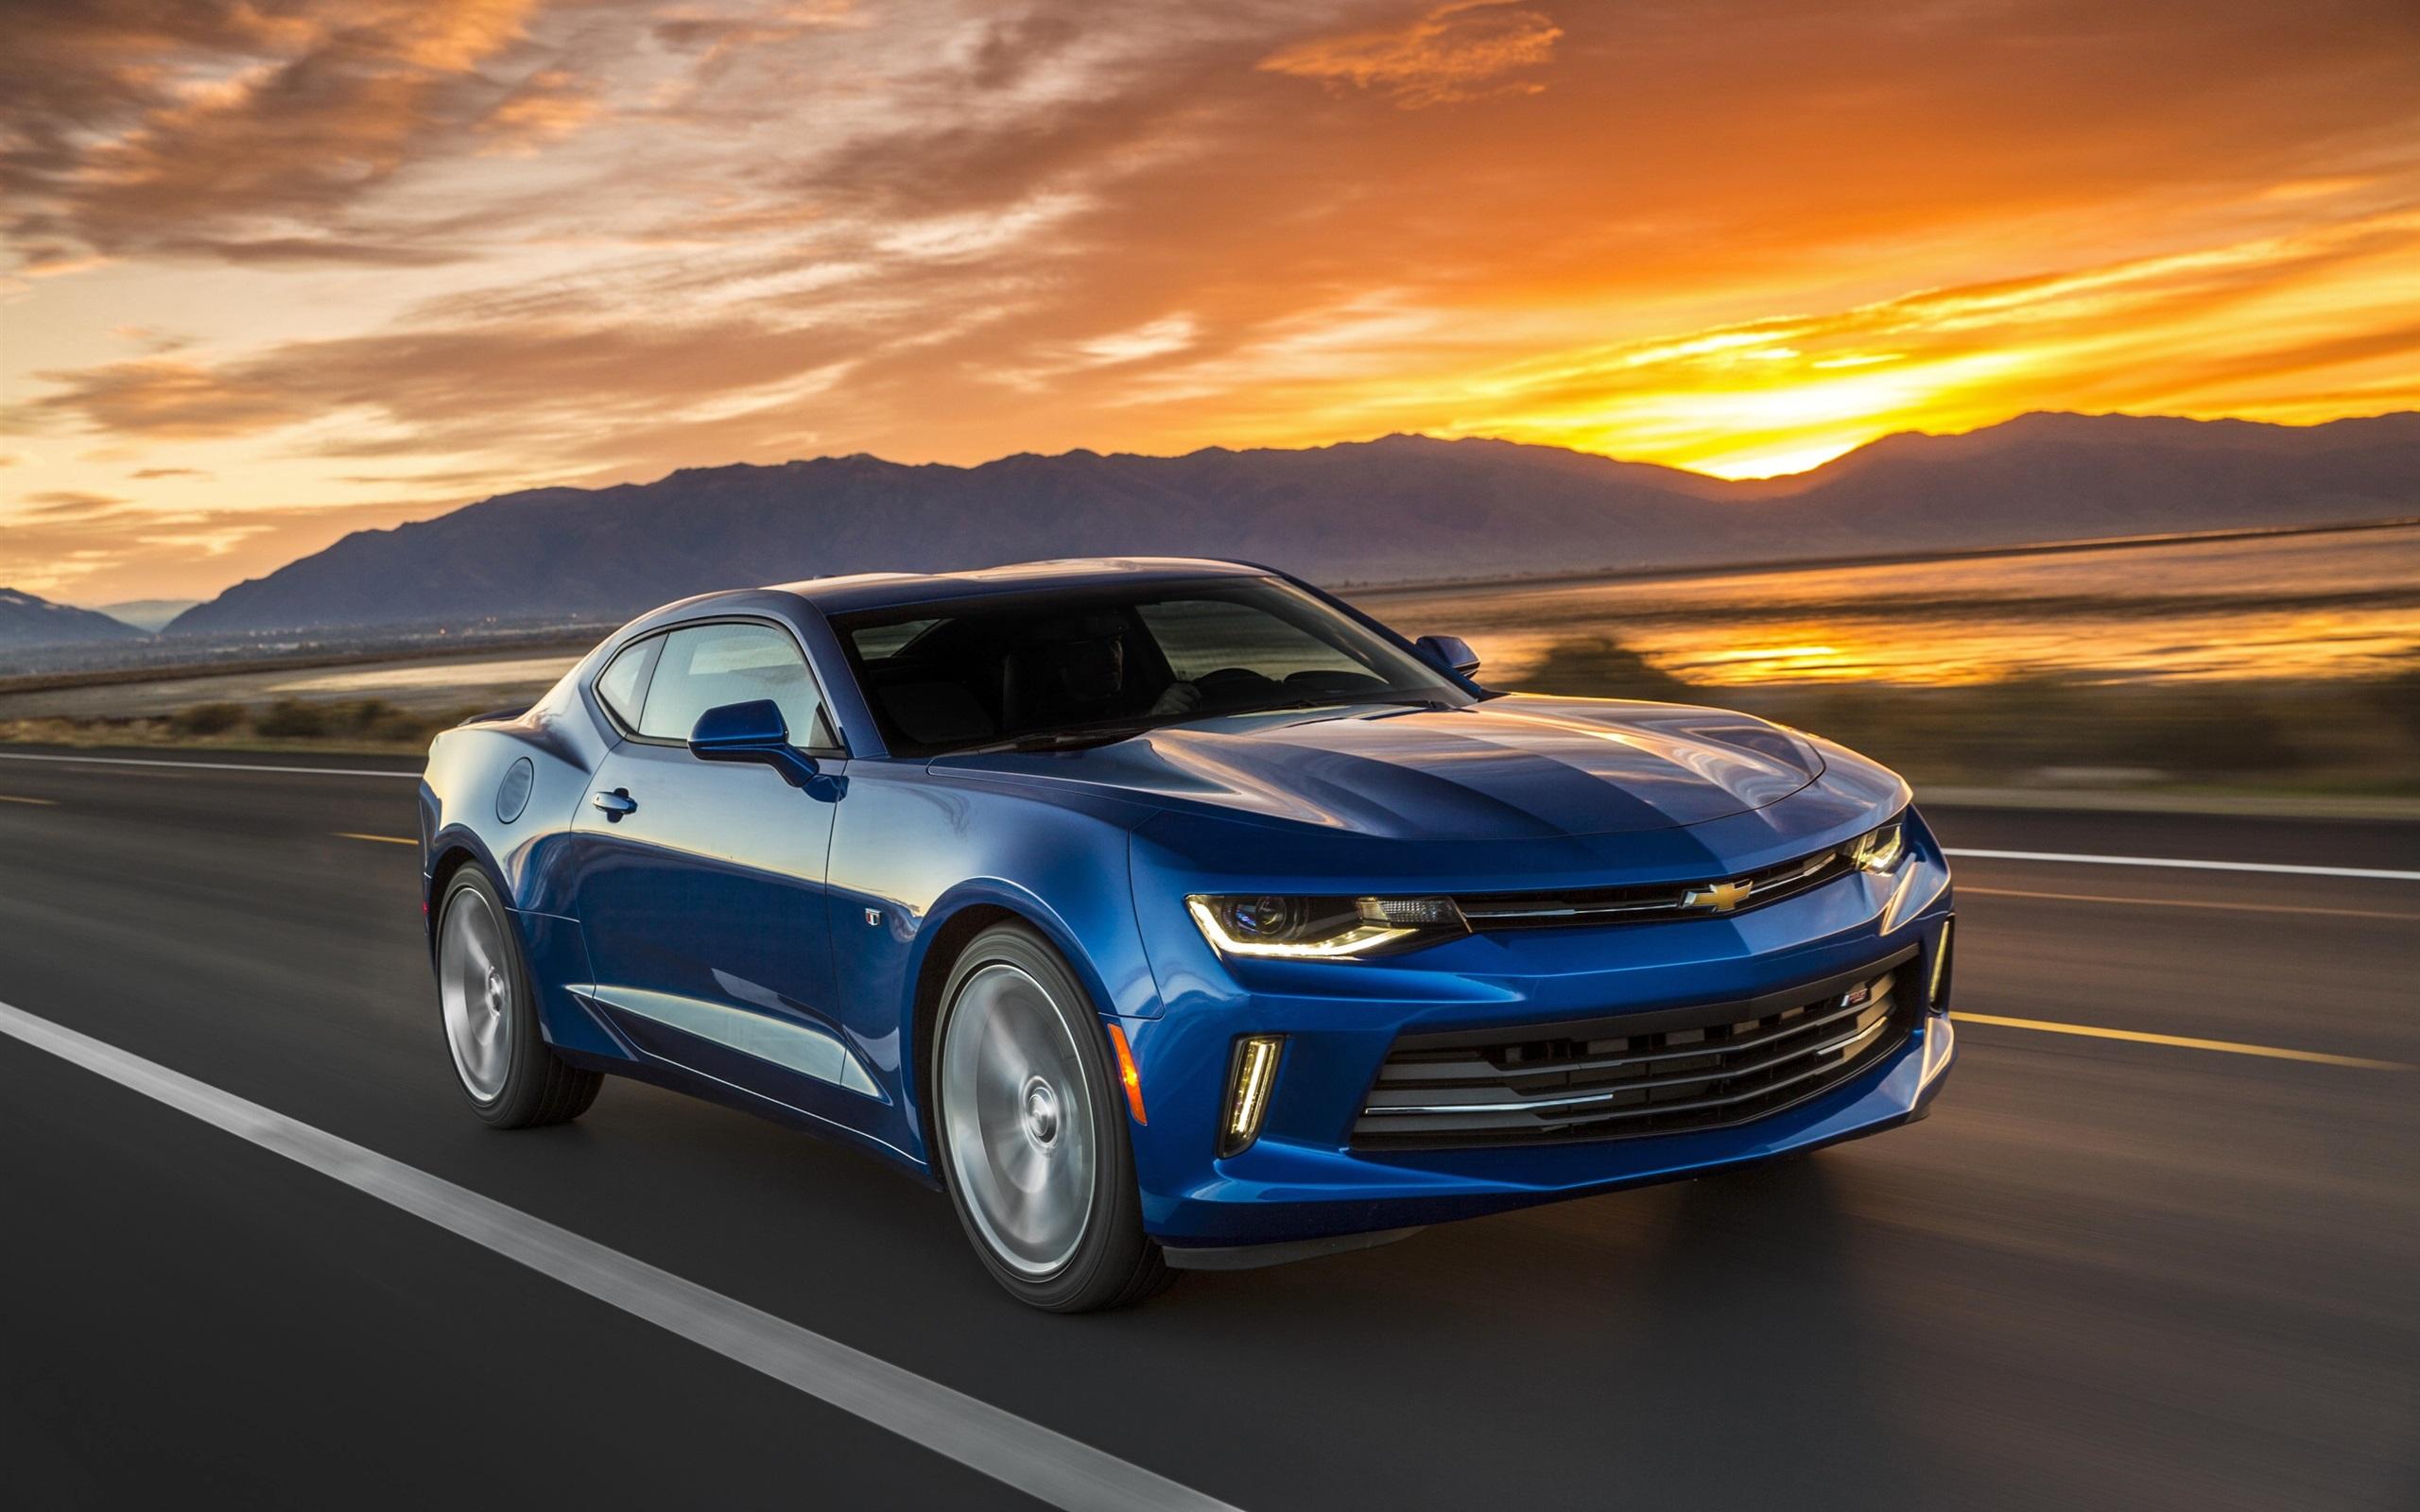 Wallpaper Chevrolet Camaro Blue Car Speed Sunset 2560x1600